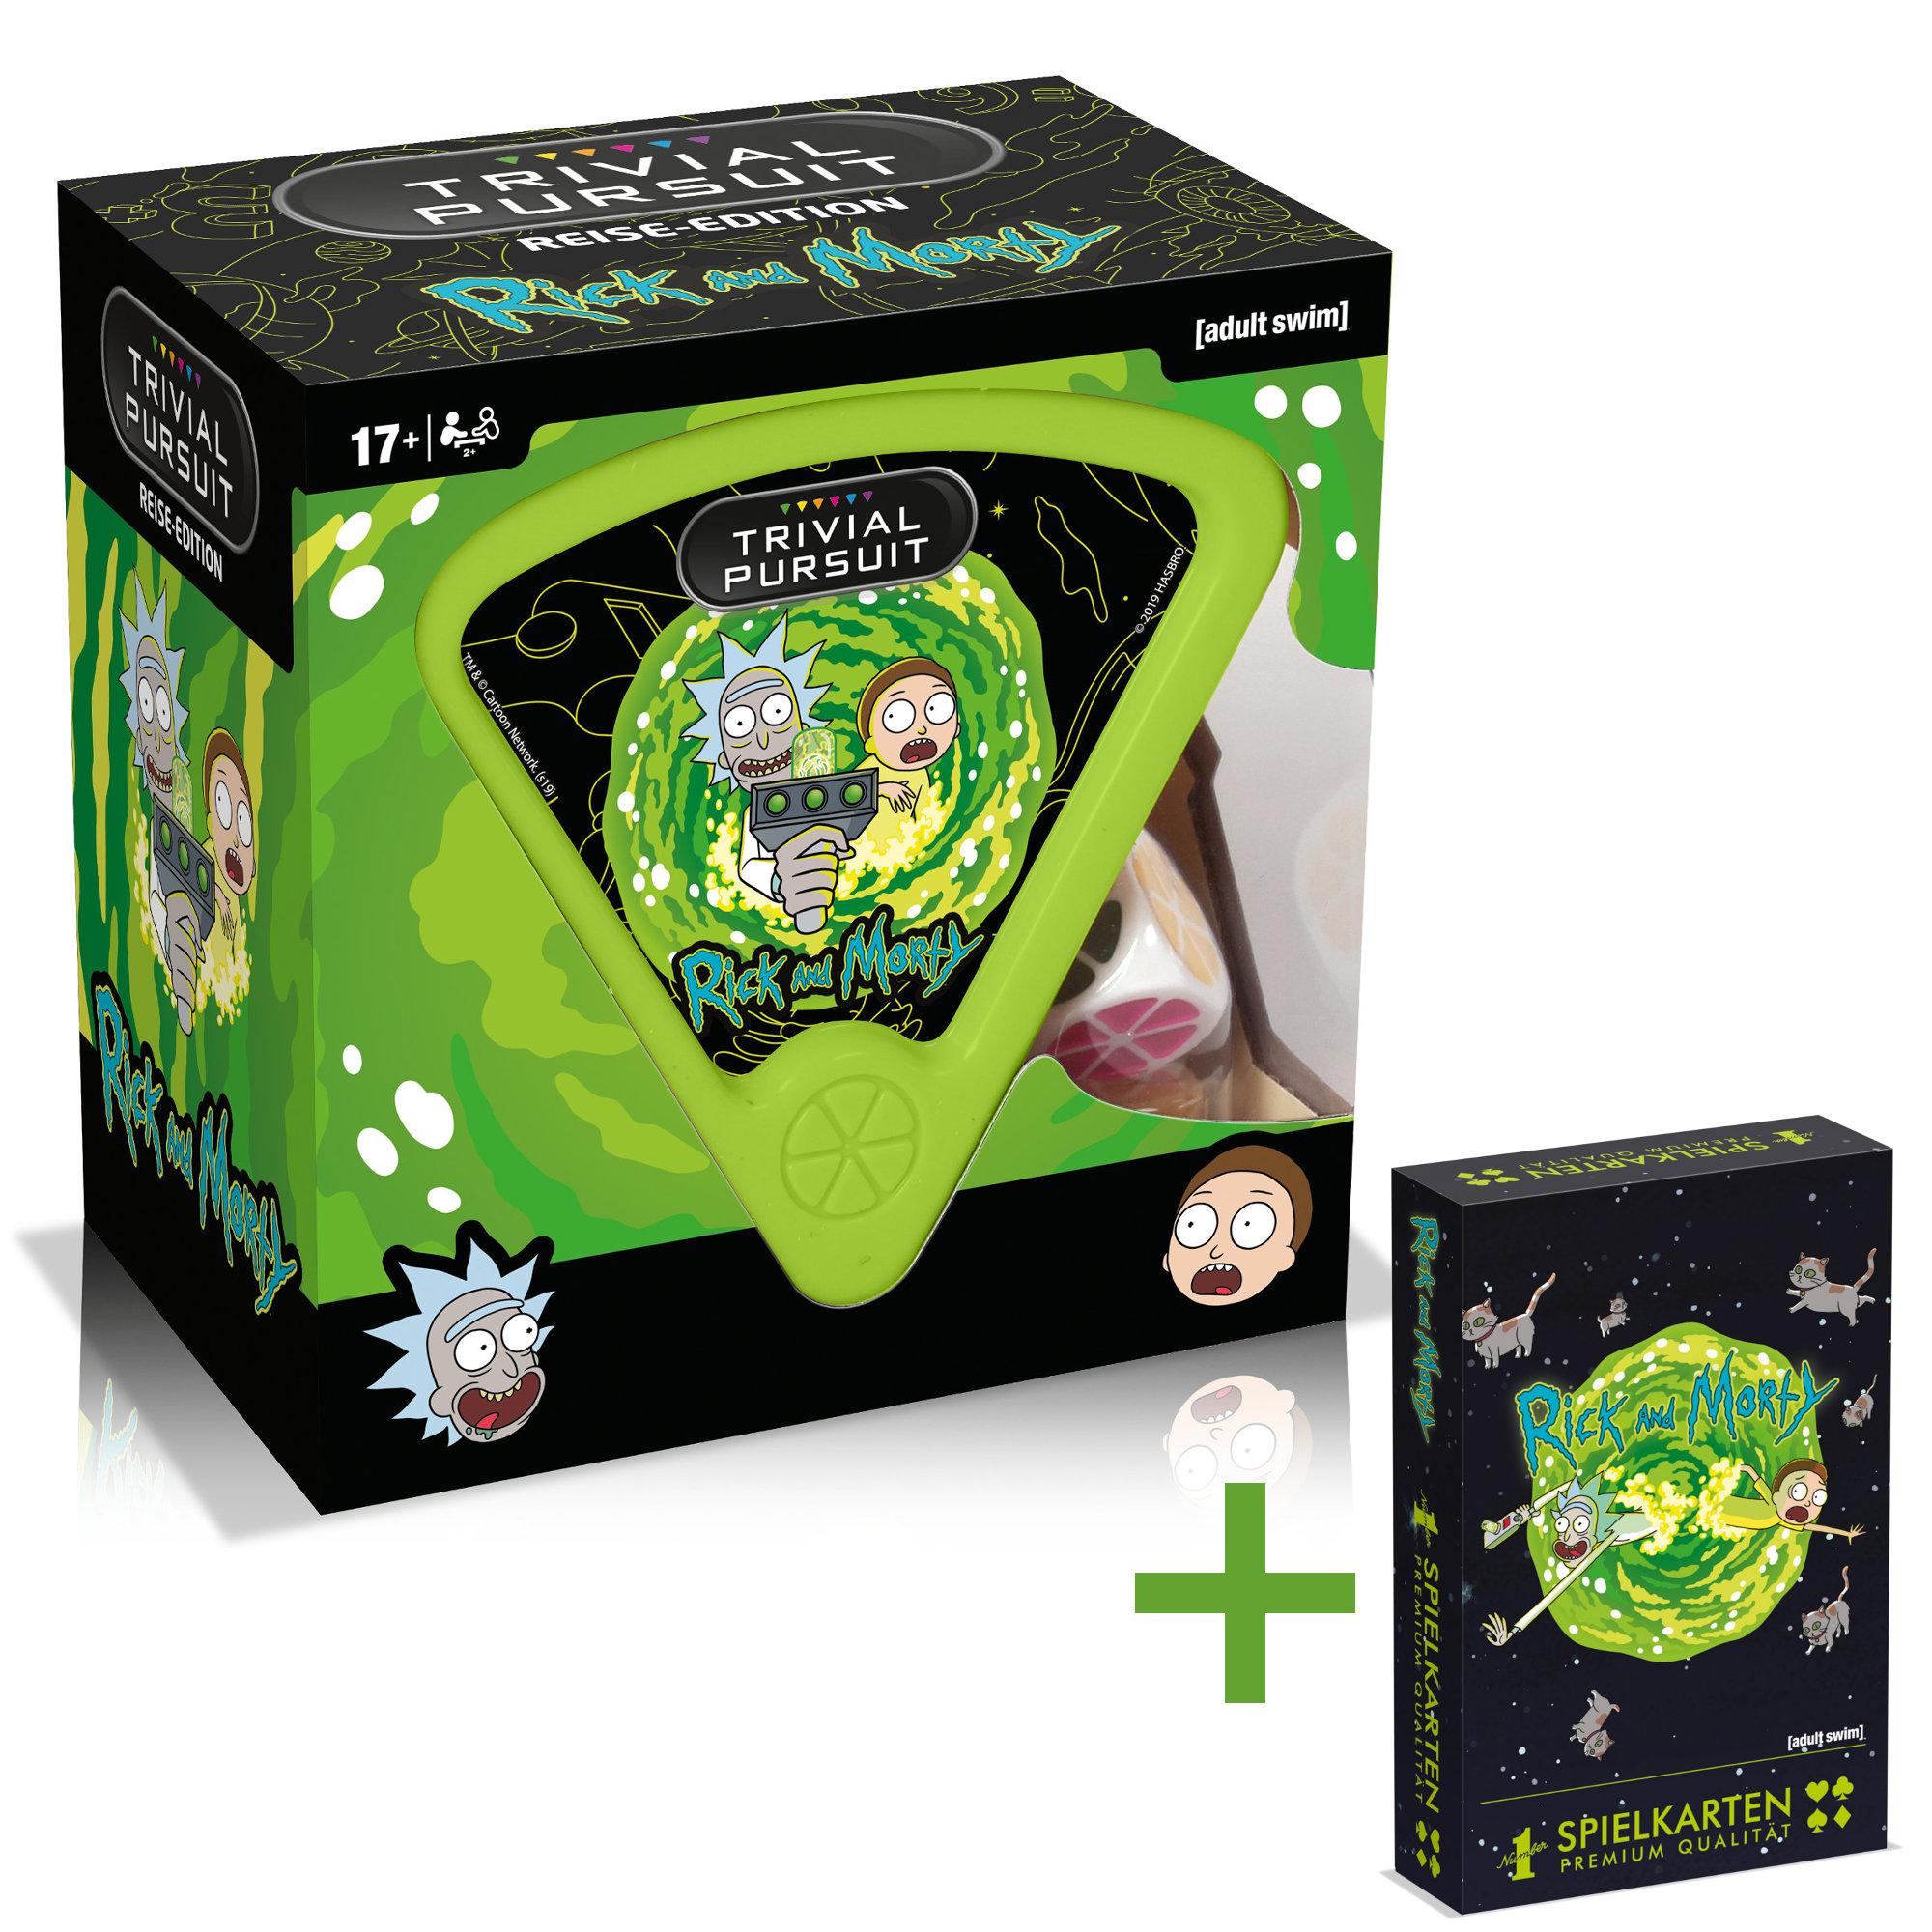 Special Offer: Trivial Pursuit Rick and Morty deutsch + Spielkarten